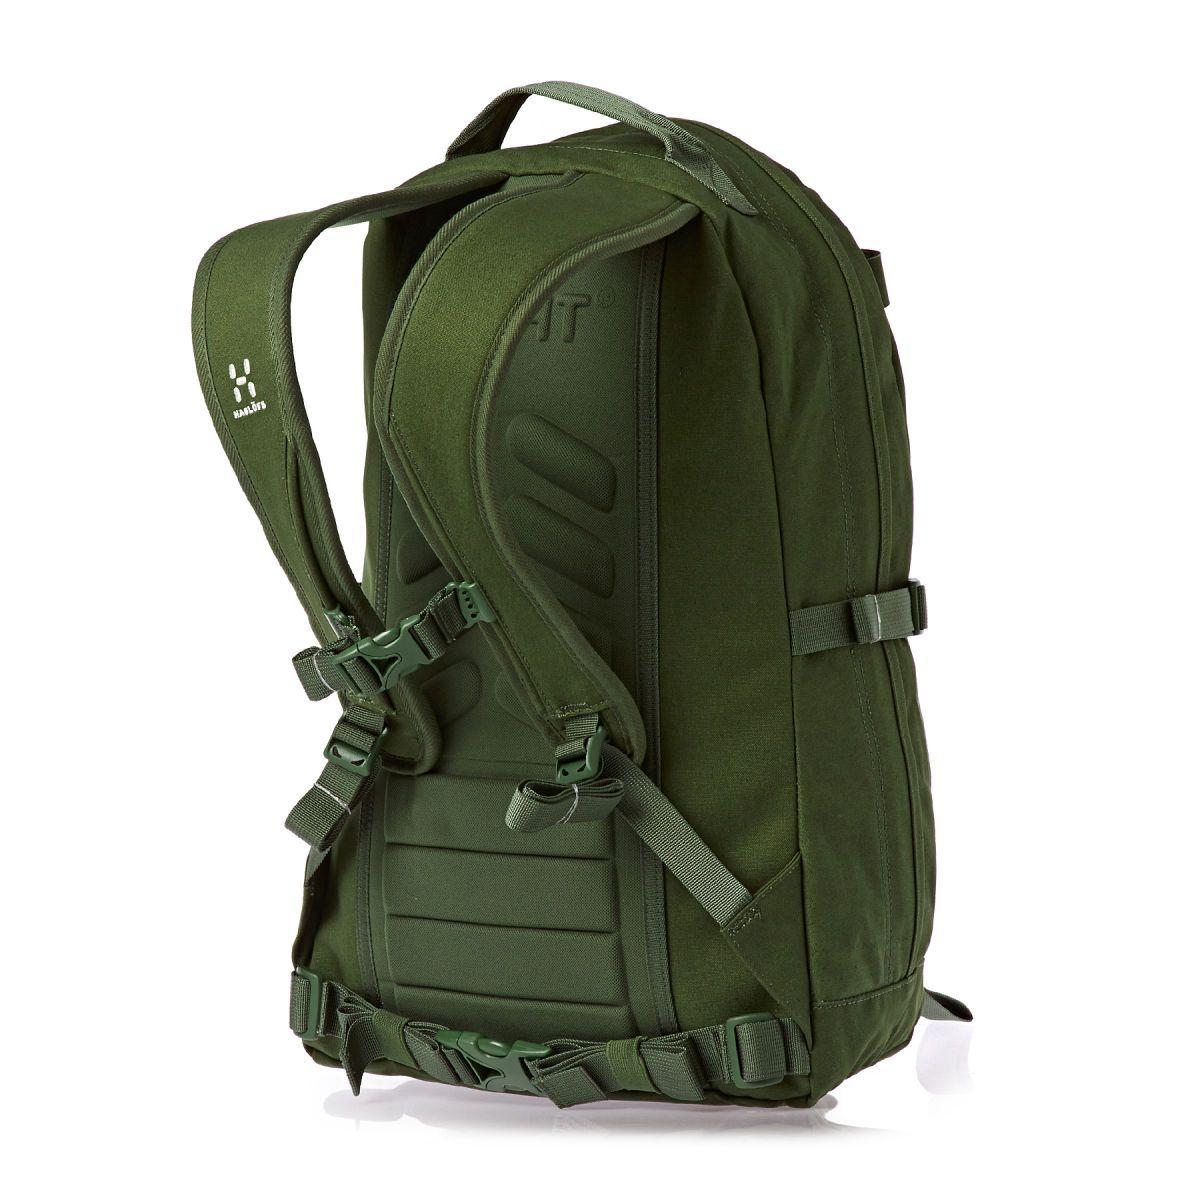 Haglofs Tight Rugged 13 Backpack Juniper Backpacks Bags Tights